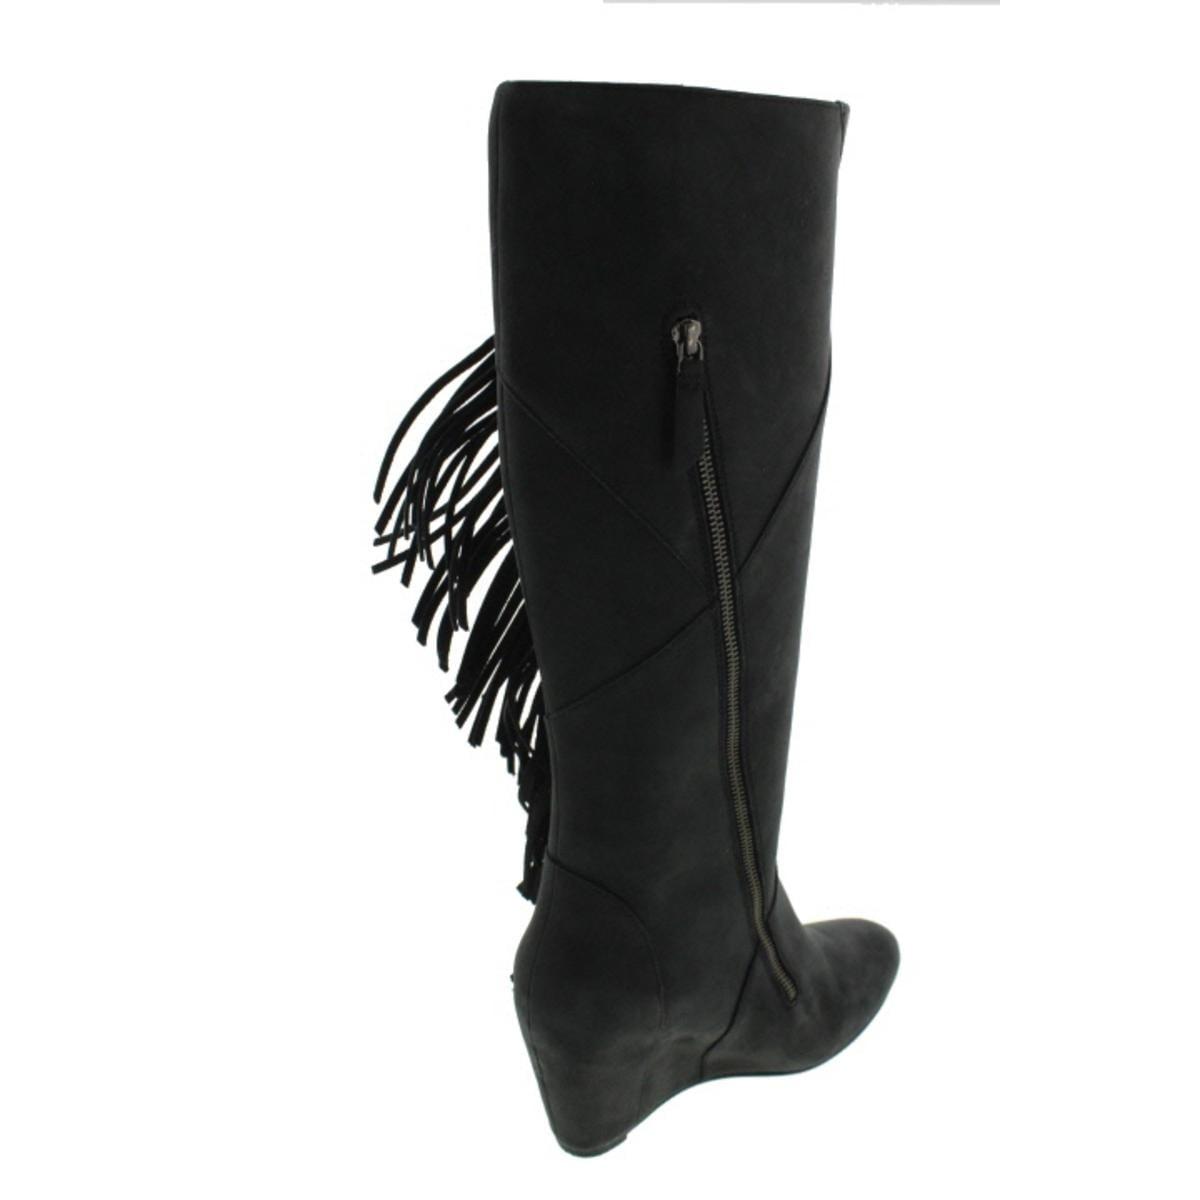 23247f2be611 Shop Koolaburra Womens Paradis Leather Fringe Wedge Boots - Free Shipping  Today - Overstock.com - 13045661